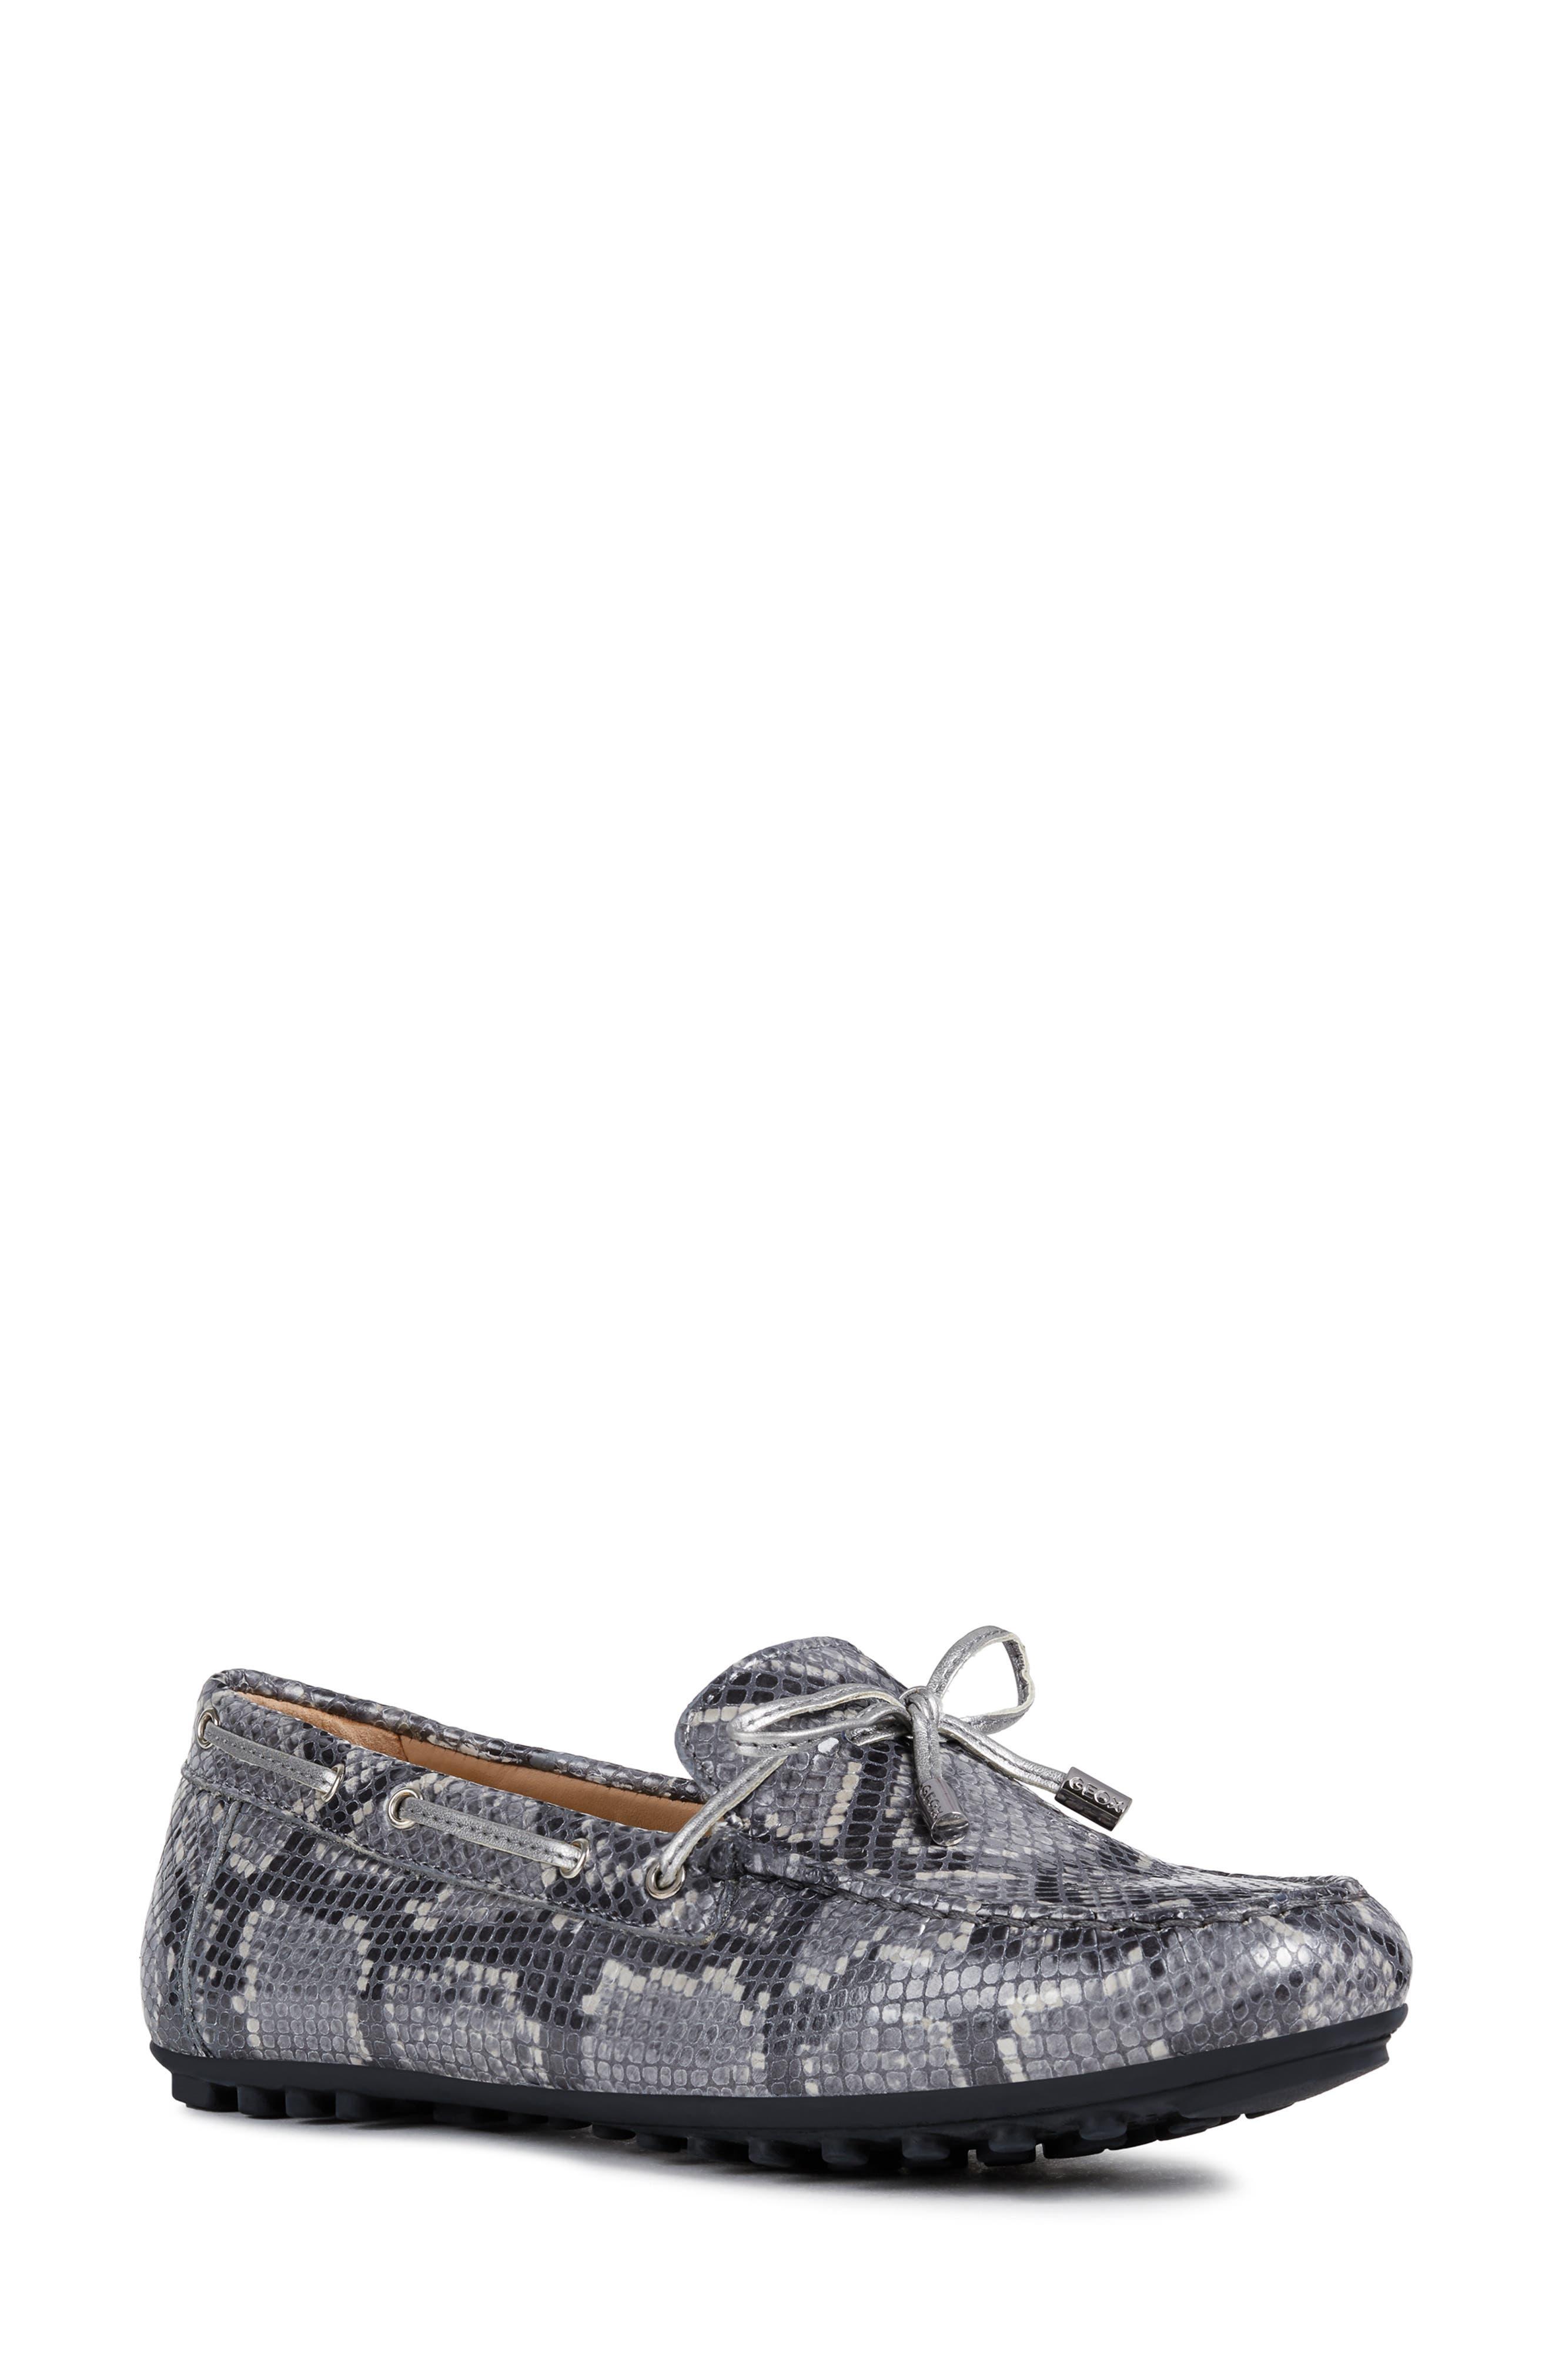 Geox Leelyan Leather Loafer, Grey